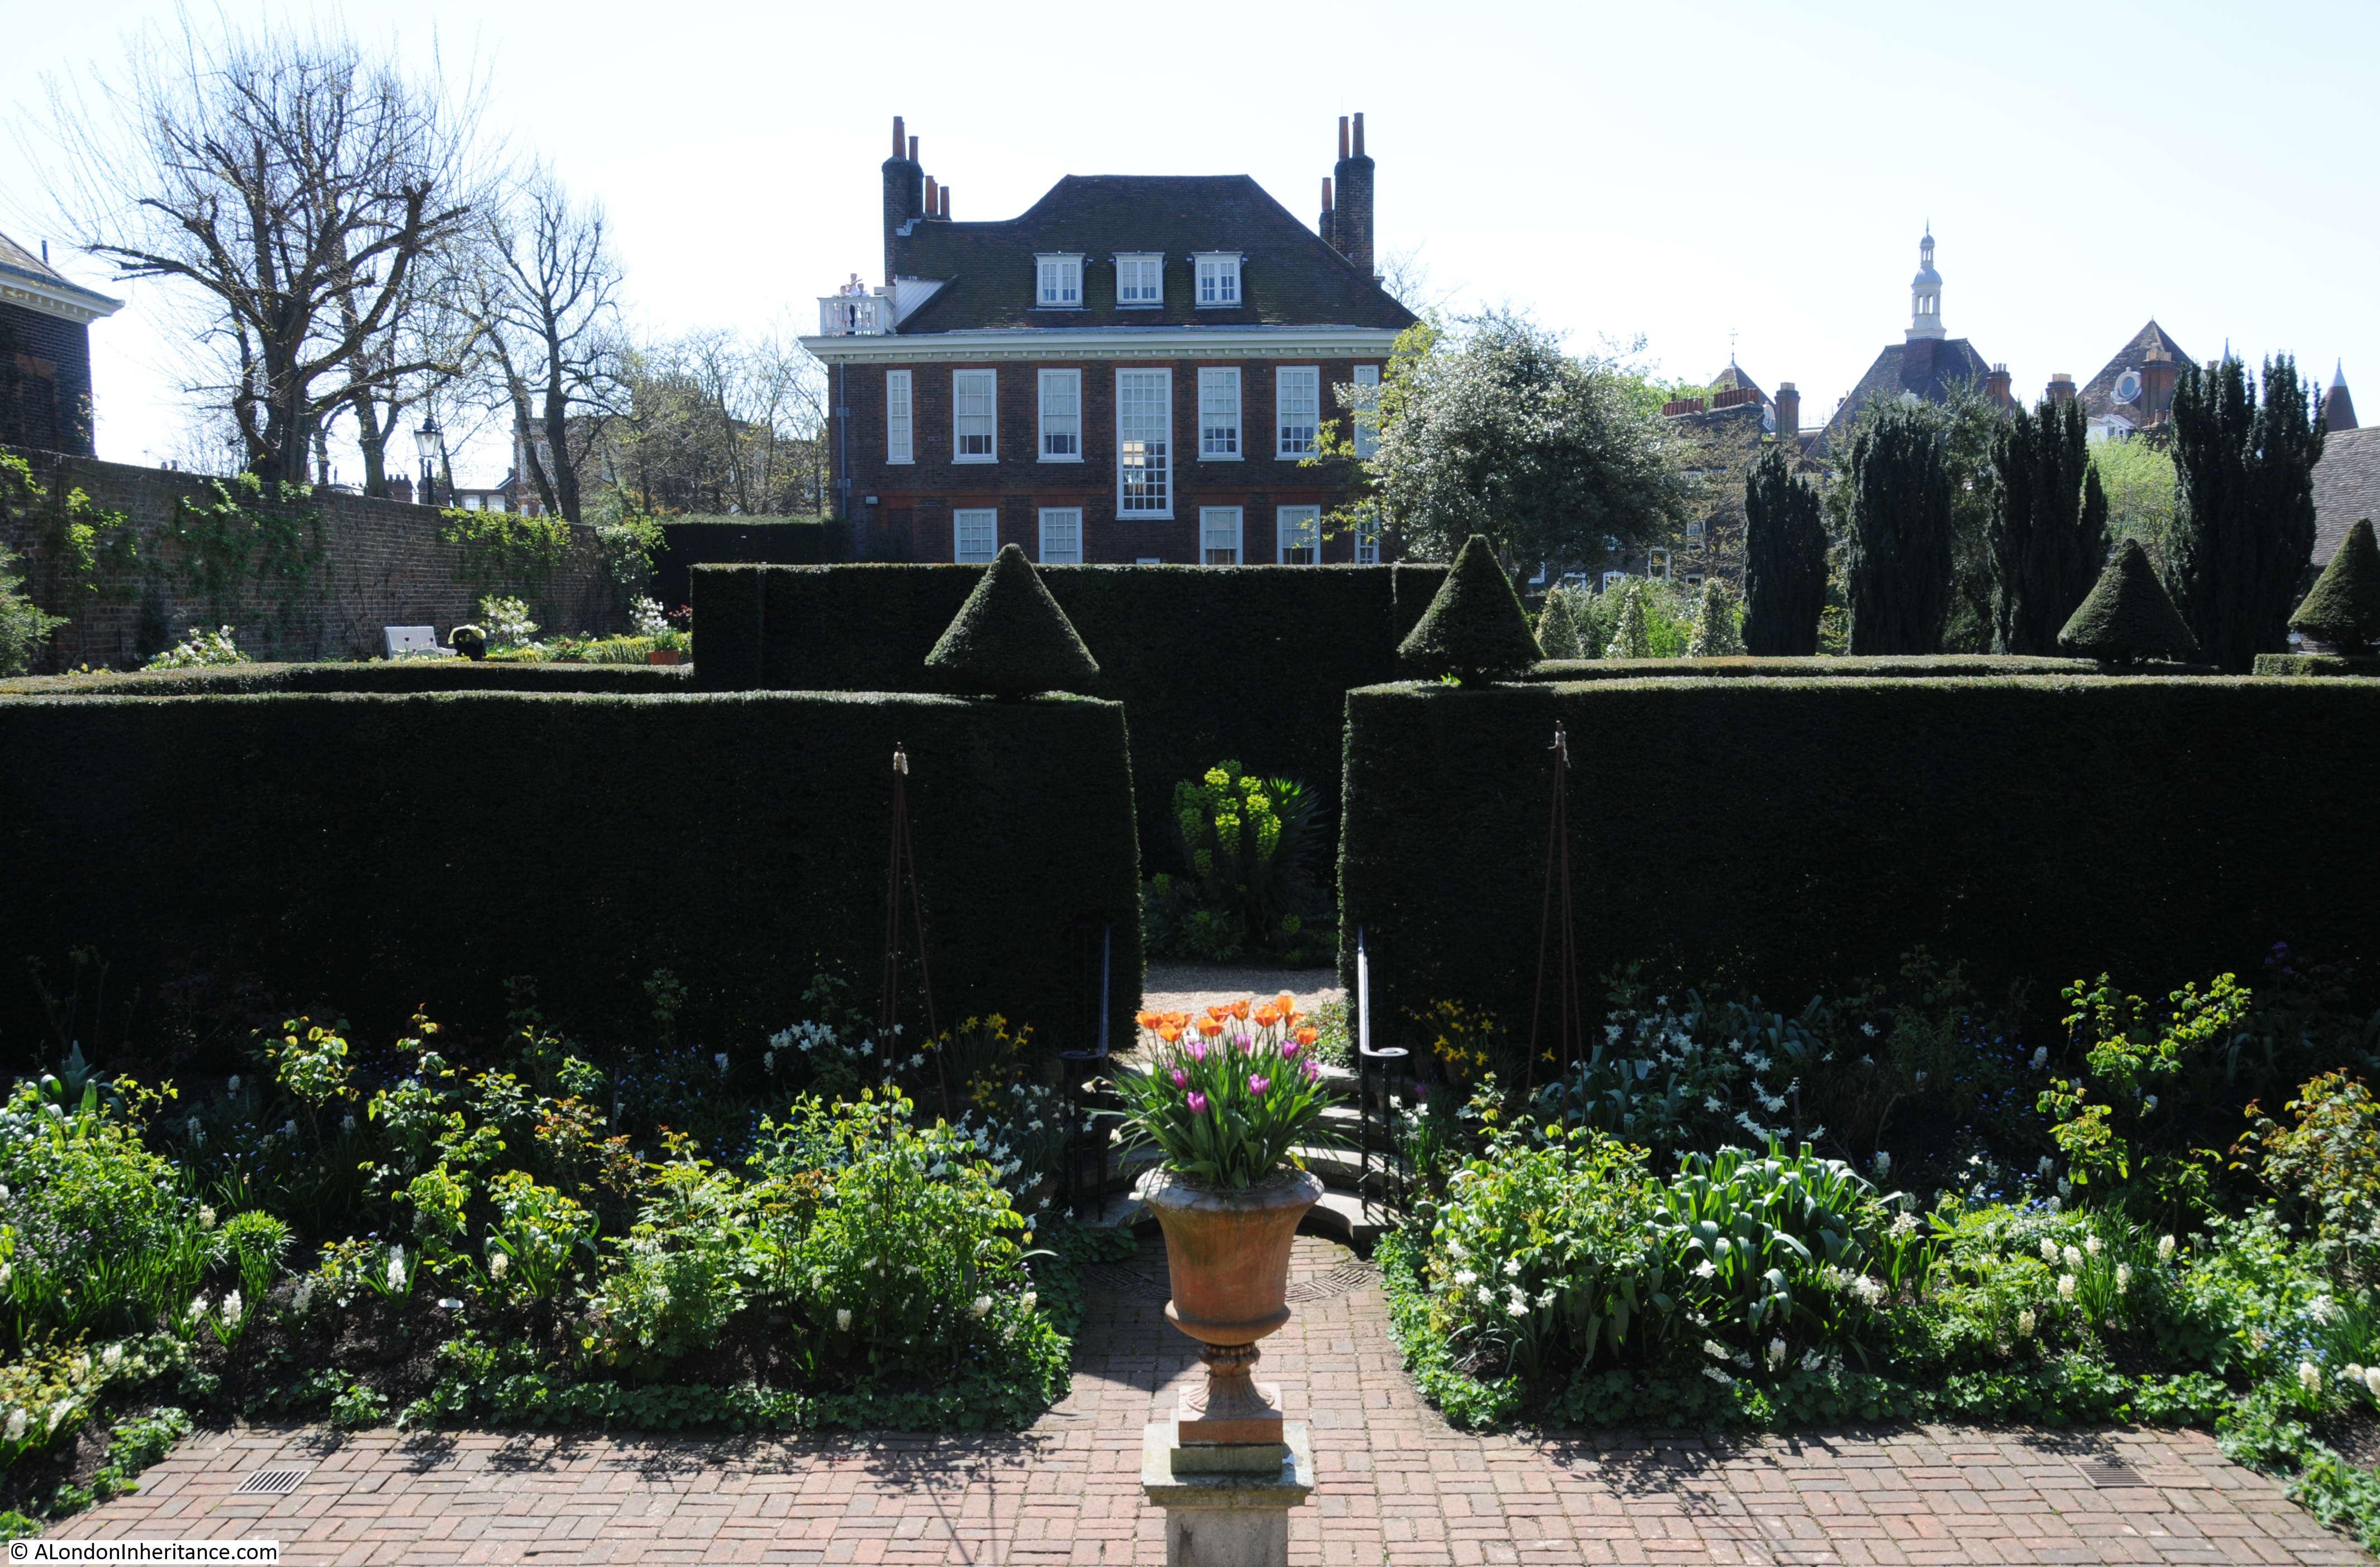 Fenton house hampstead a london inheritance for Tuxedo house